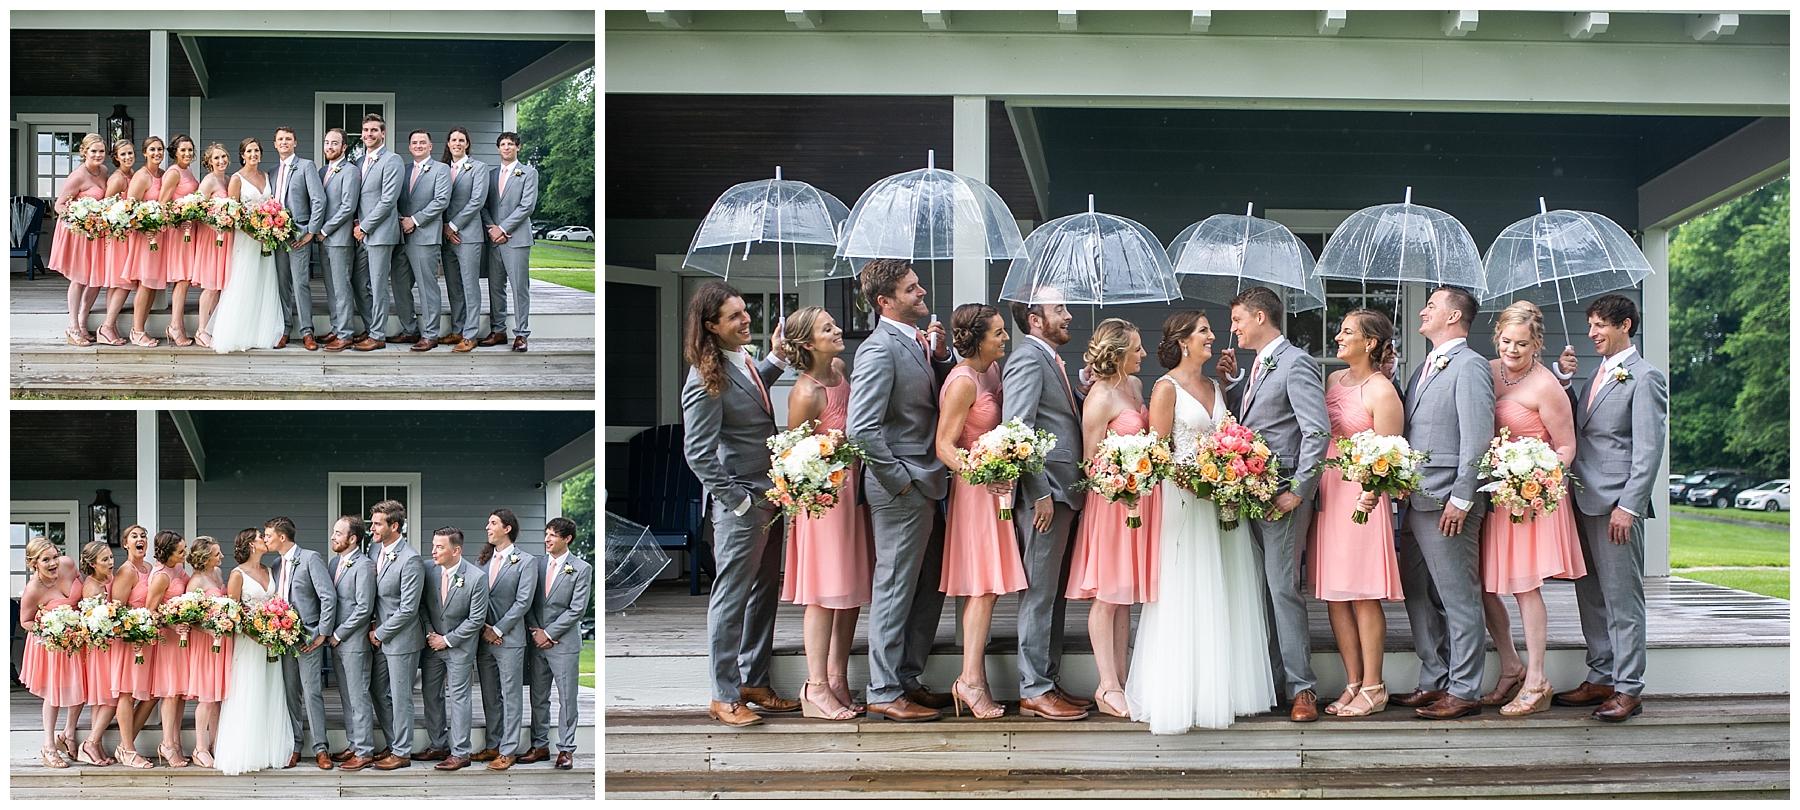 Chelsea Phil Bohemia River Overlook Wedding Living Radiant Photography photos_0078.jpg